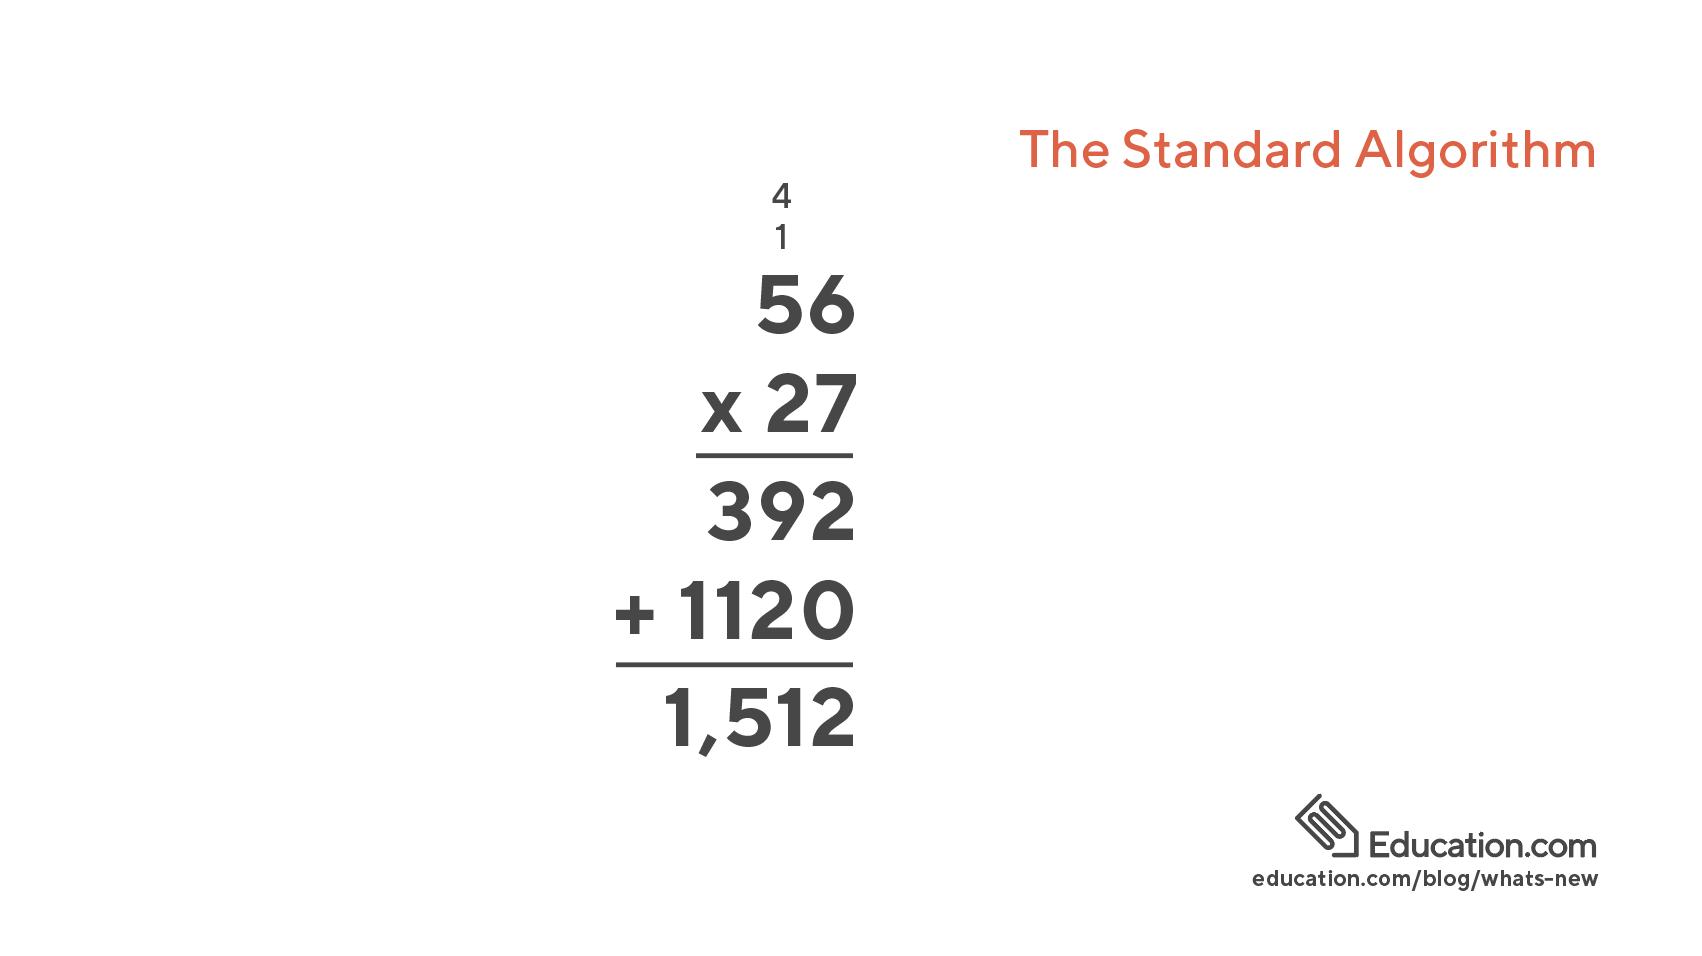 Standard Algorithm example